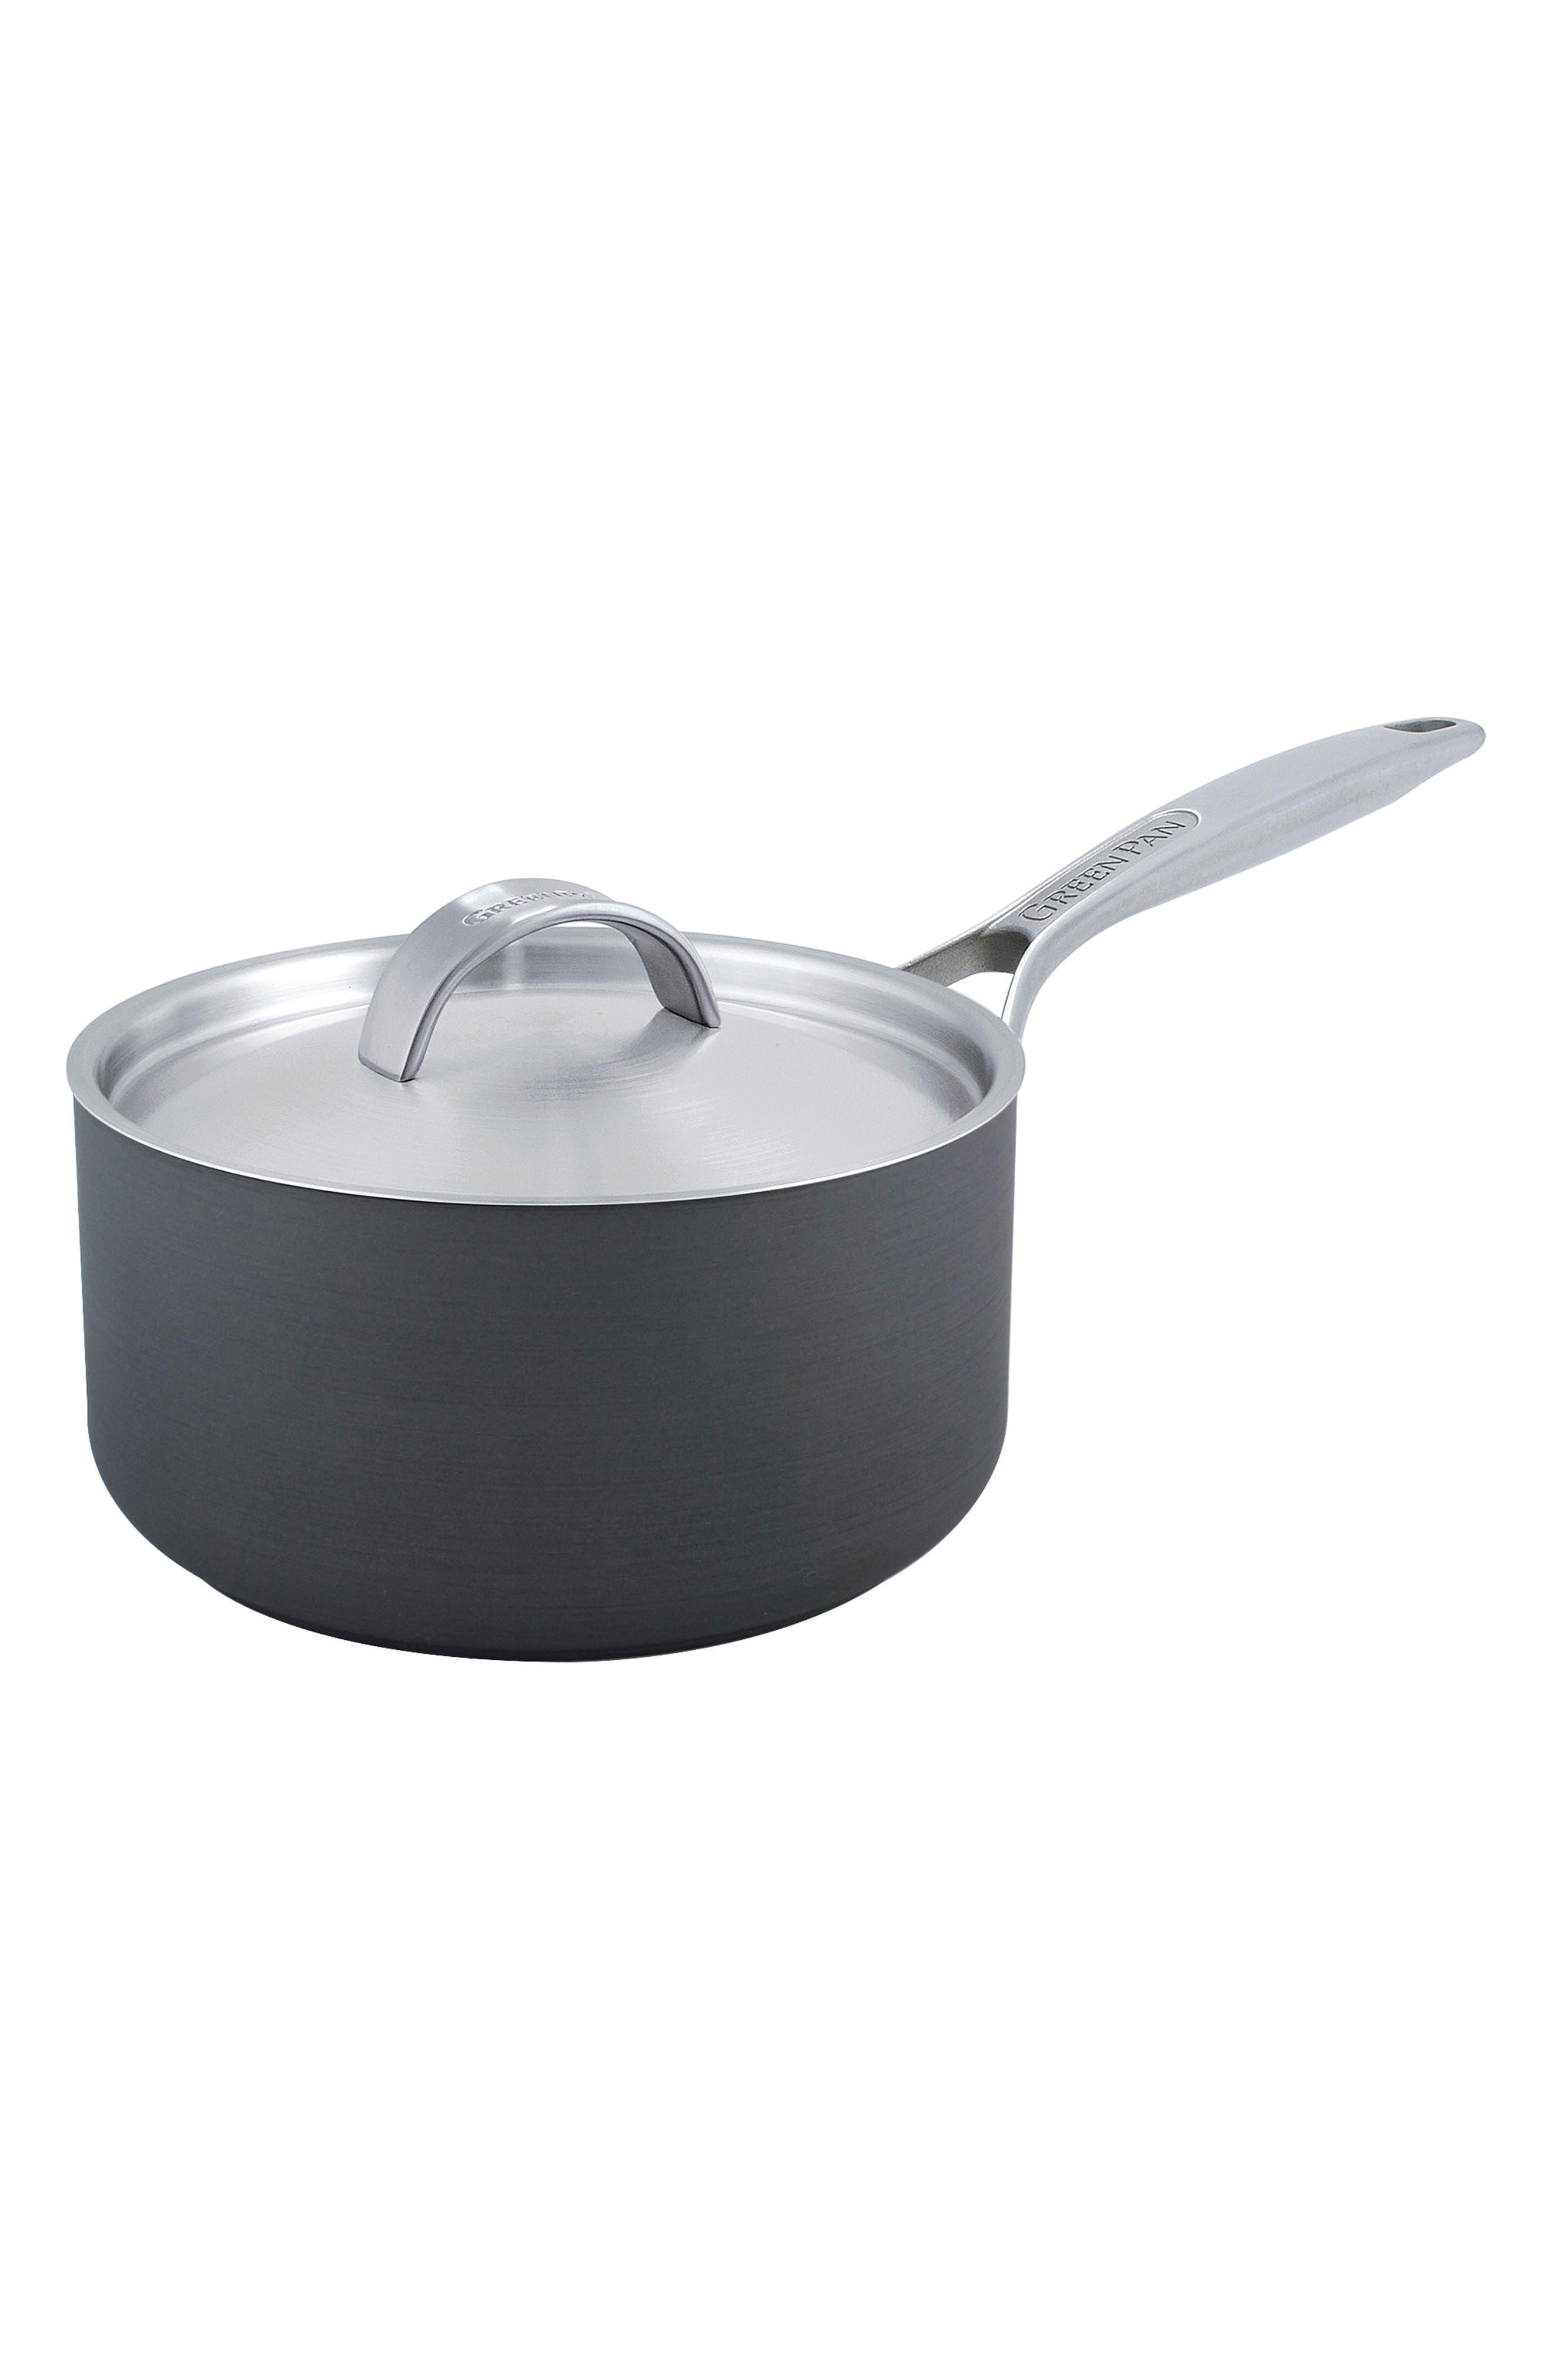 Paris 3-Quart Multilayer Stainless Steel Ceramic Nonstick Saucepan with Lid,                         Main,                         color, Grey